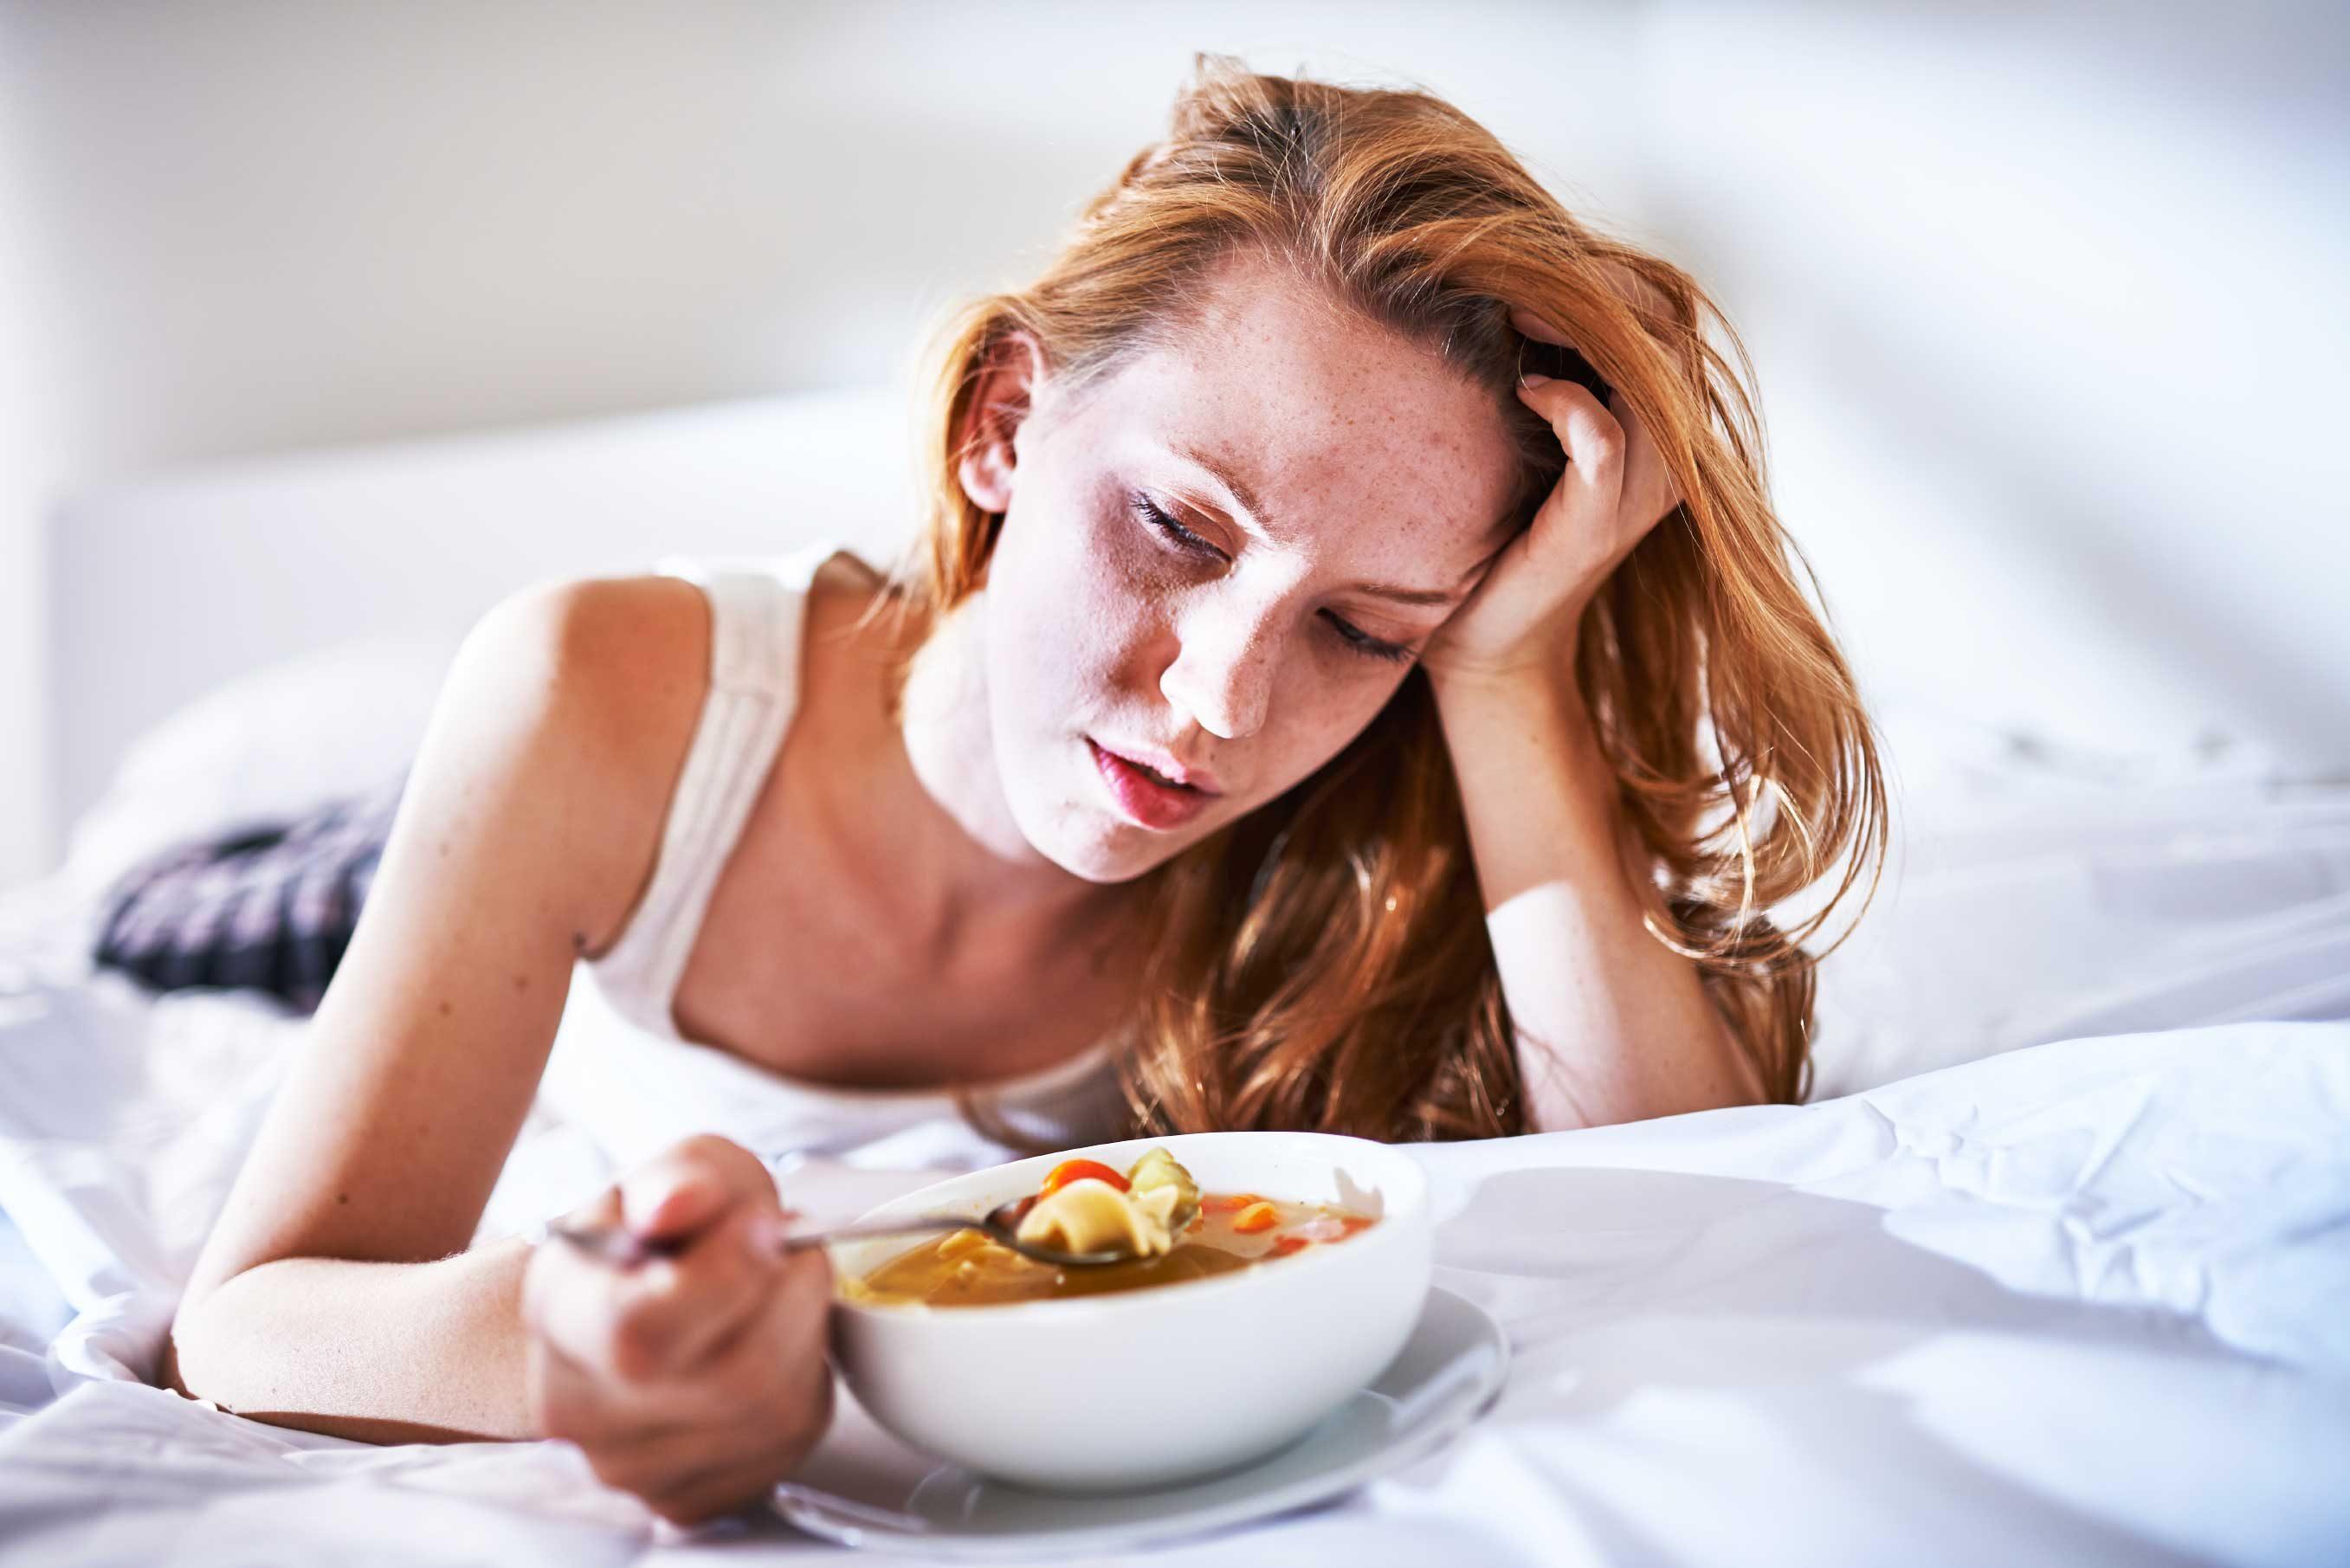 Resultado de imagen para person eating without appetite